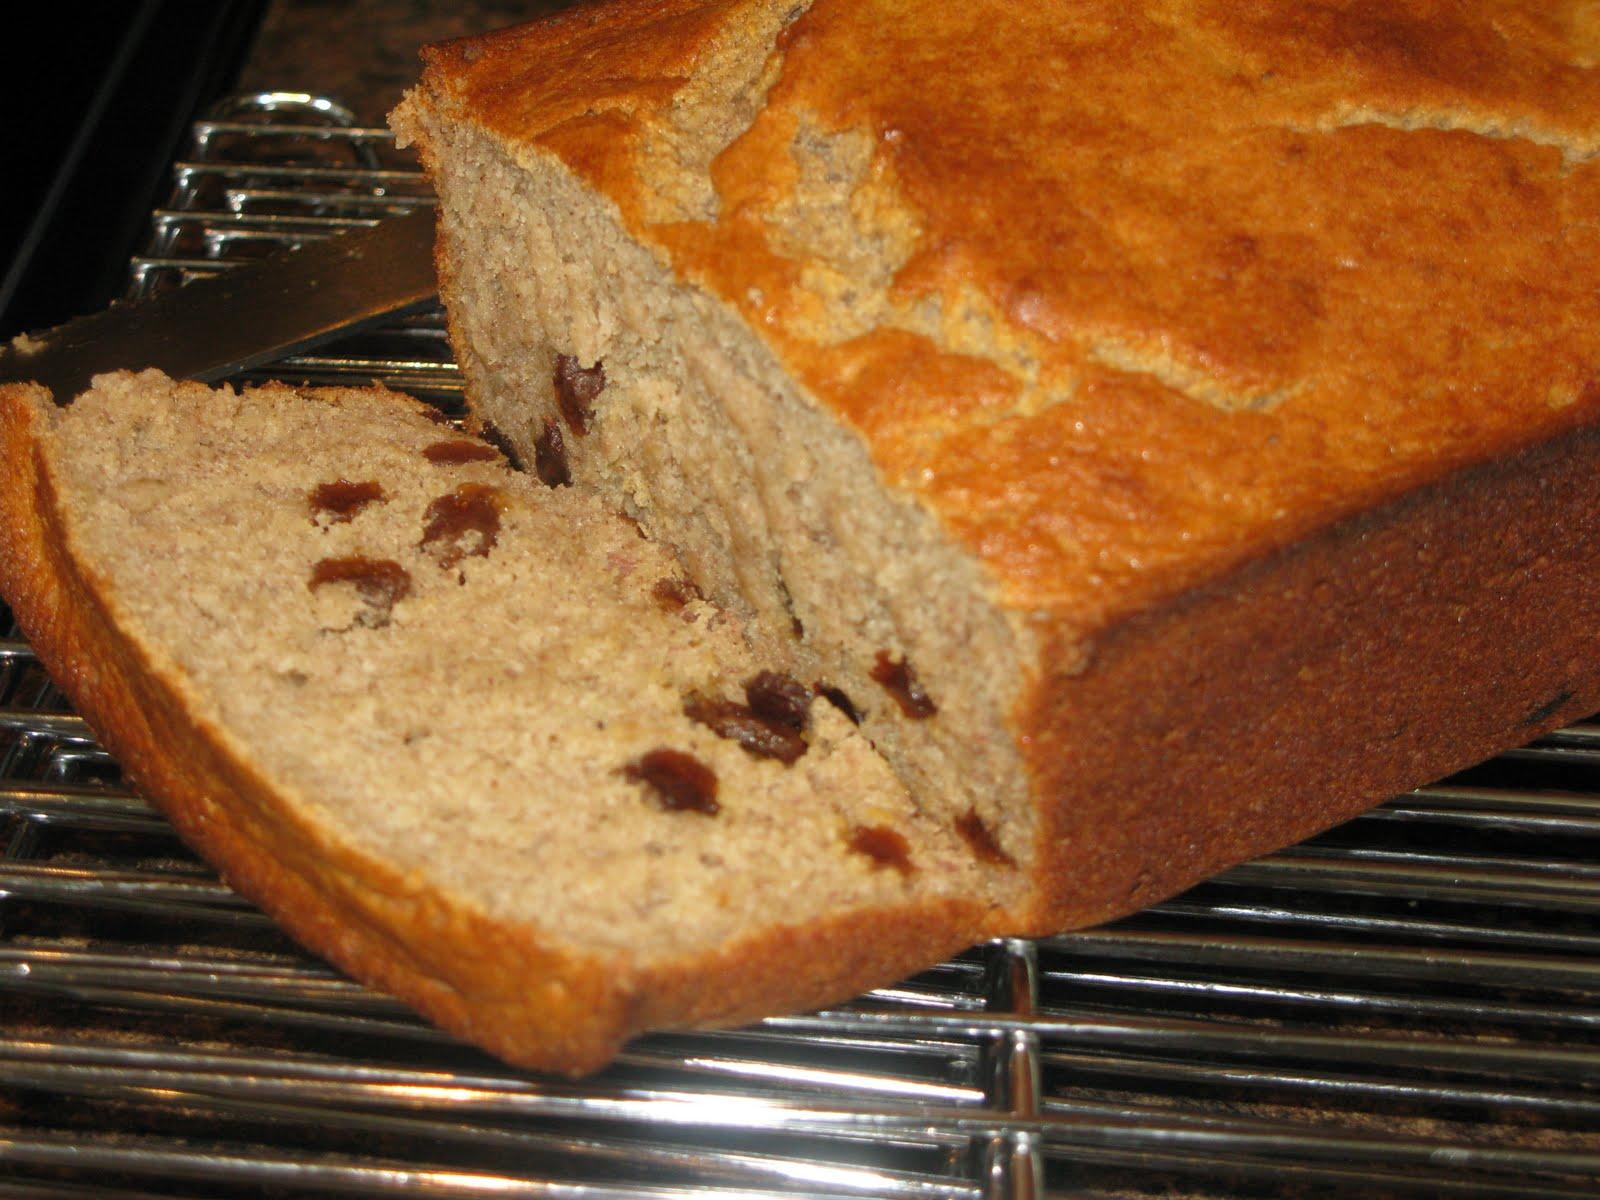 Gluten Free Banana Bread With Yellow Cake Mix